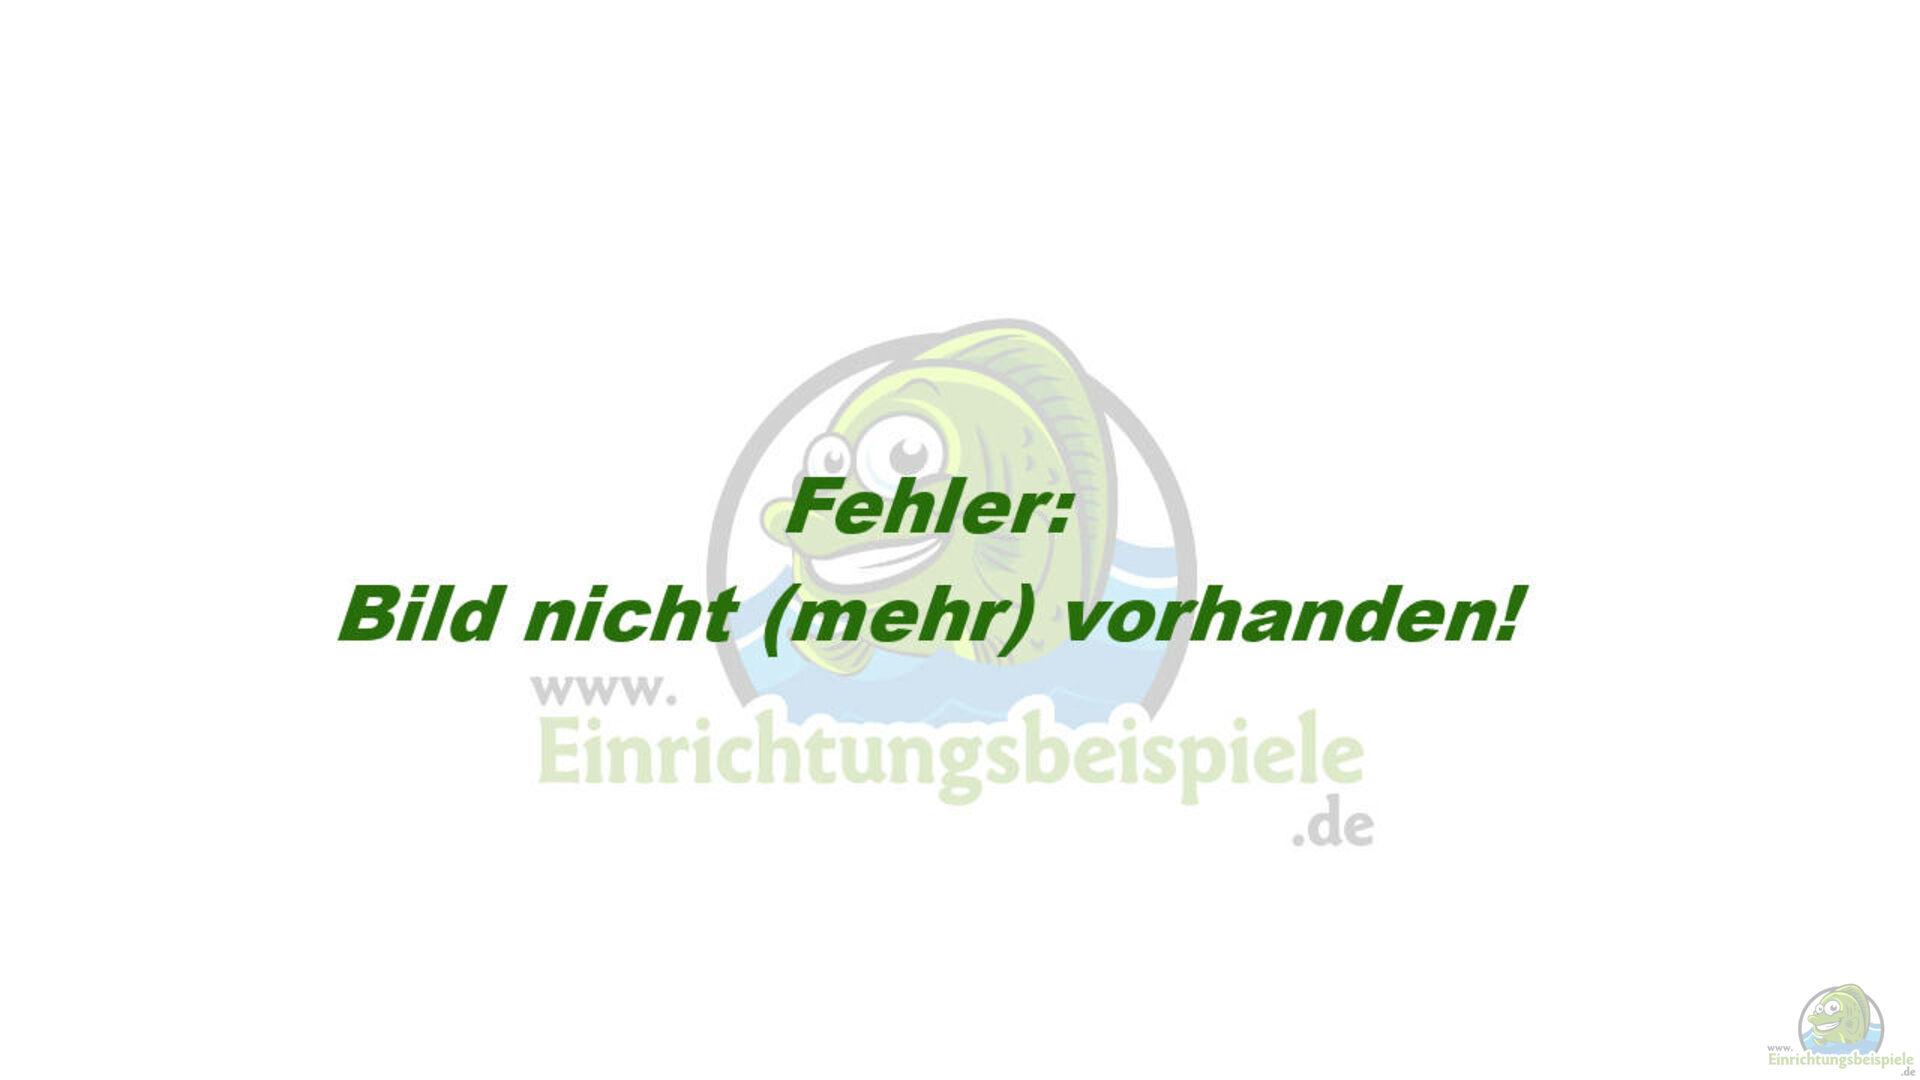 aquarium von snuppi 22159 manuels 360 liter becken. Black Bedroom Furniture Sets. Home Design Ideas